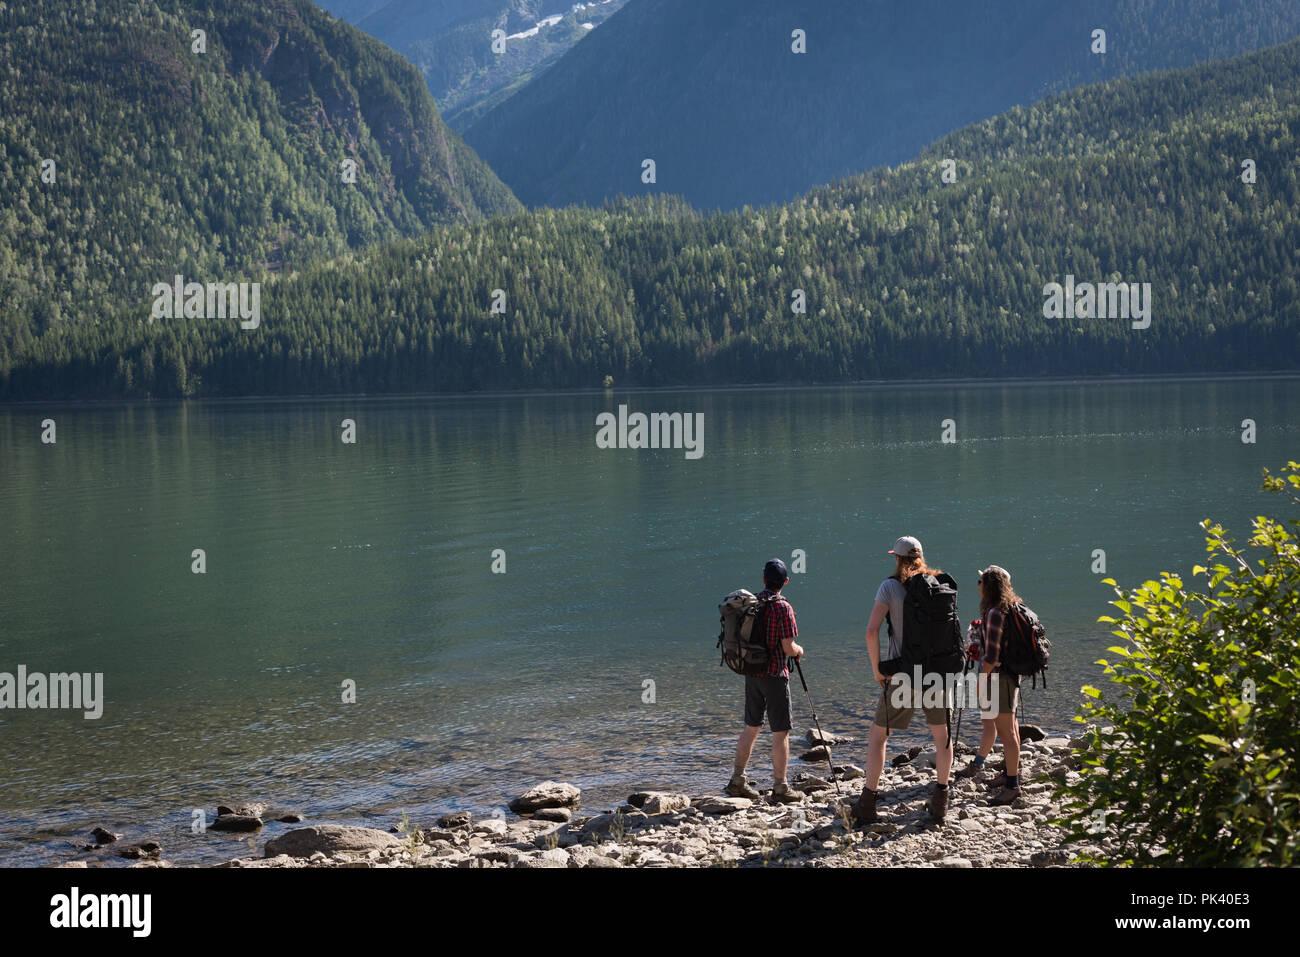 Hikers standing near riverside - Stock Image